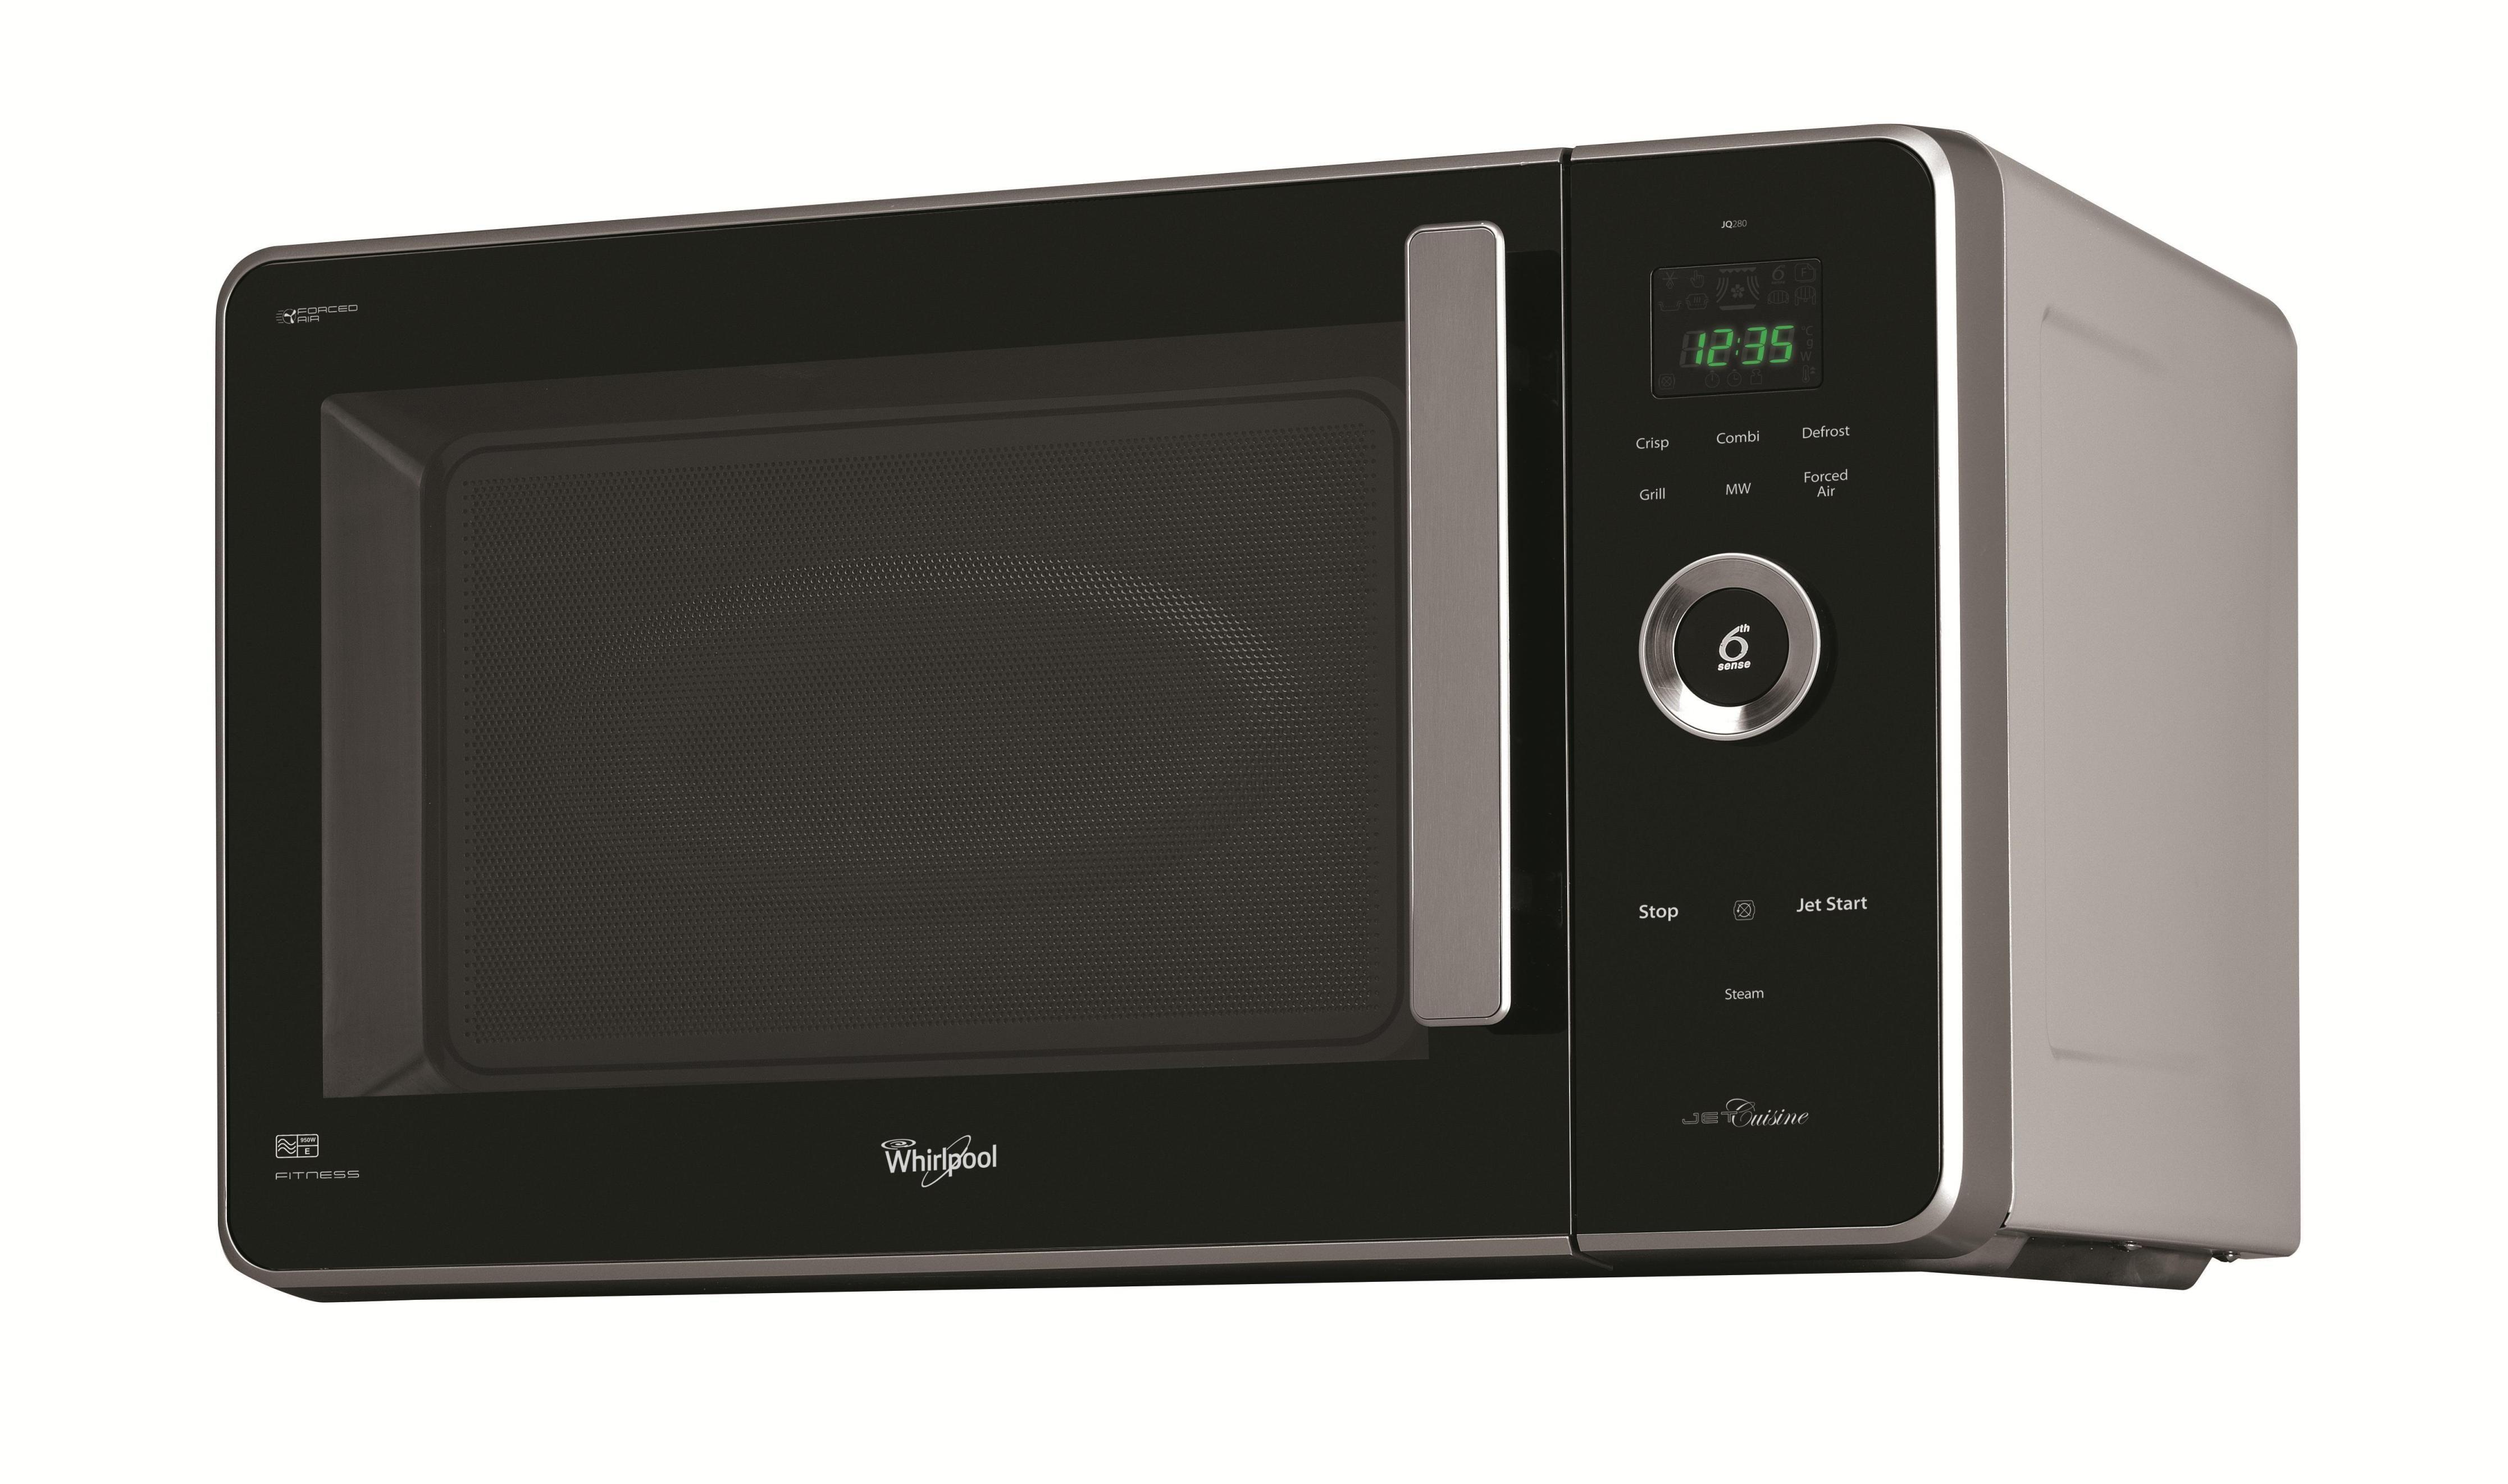 Forno a microonde Whirlpool  PED  Kitchen Appliances Appliances e Kitchen